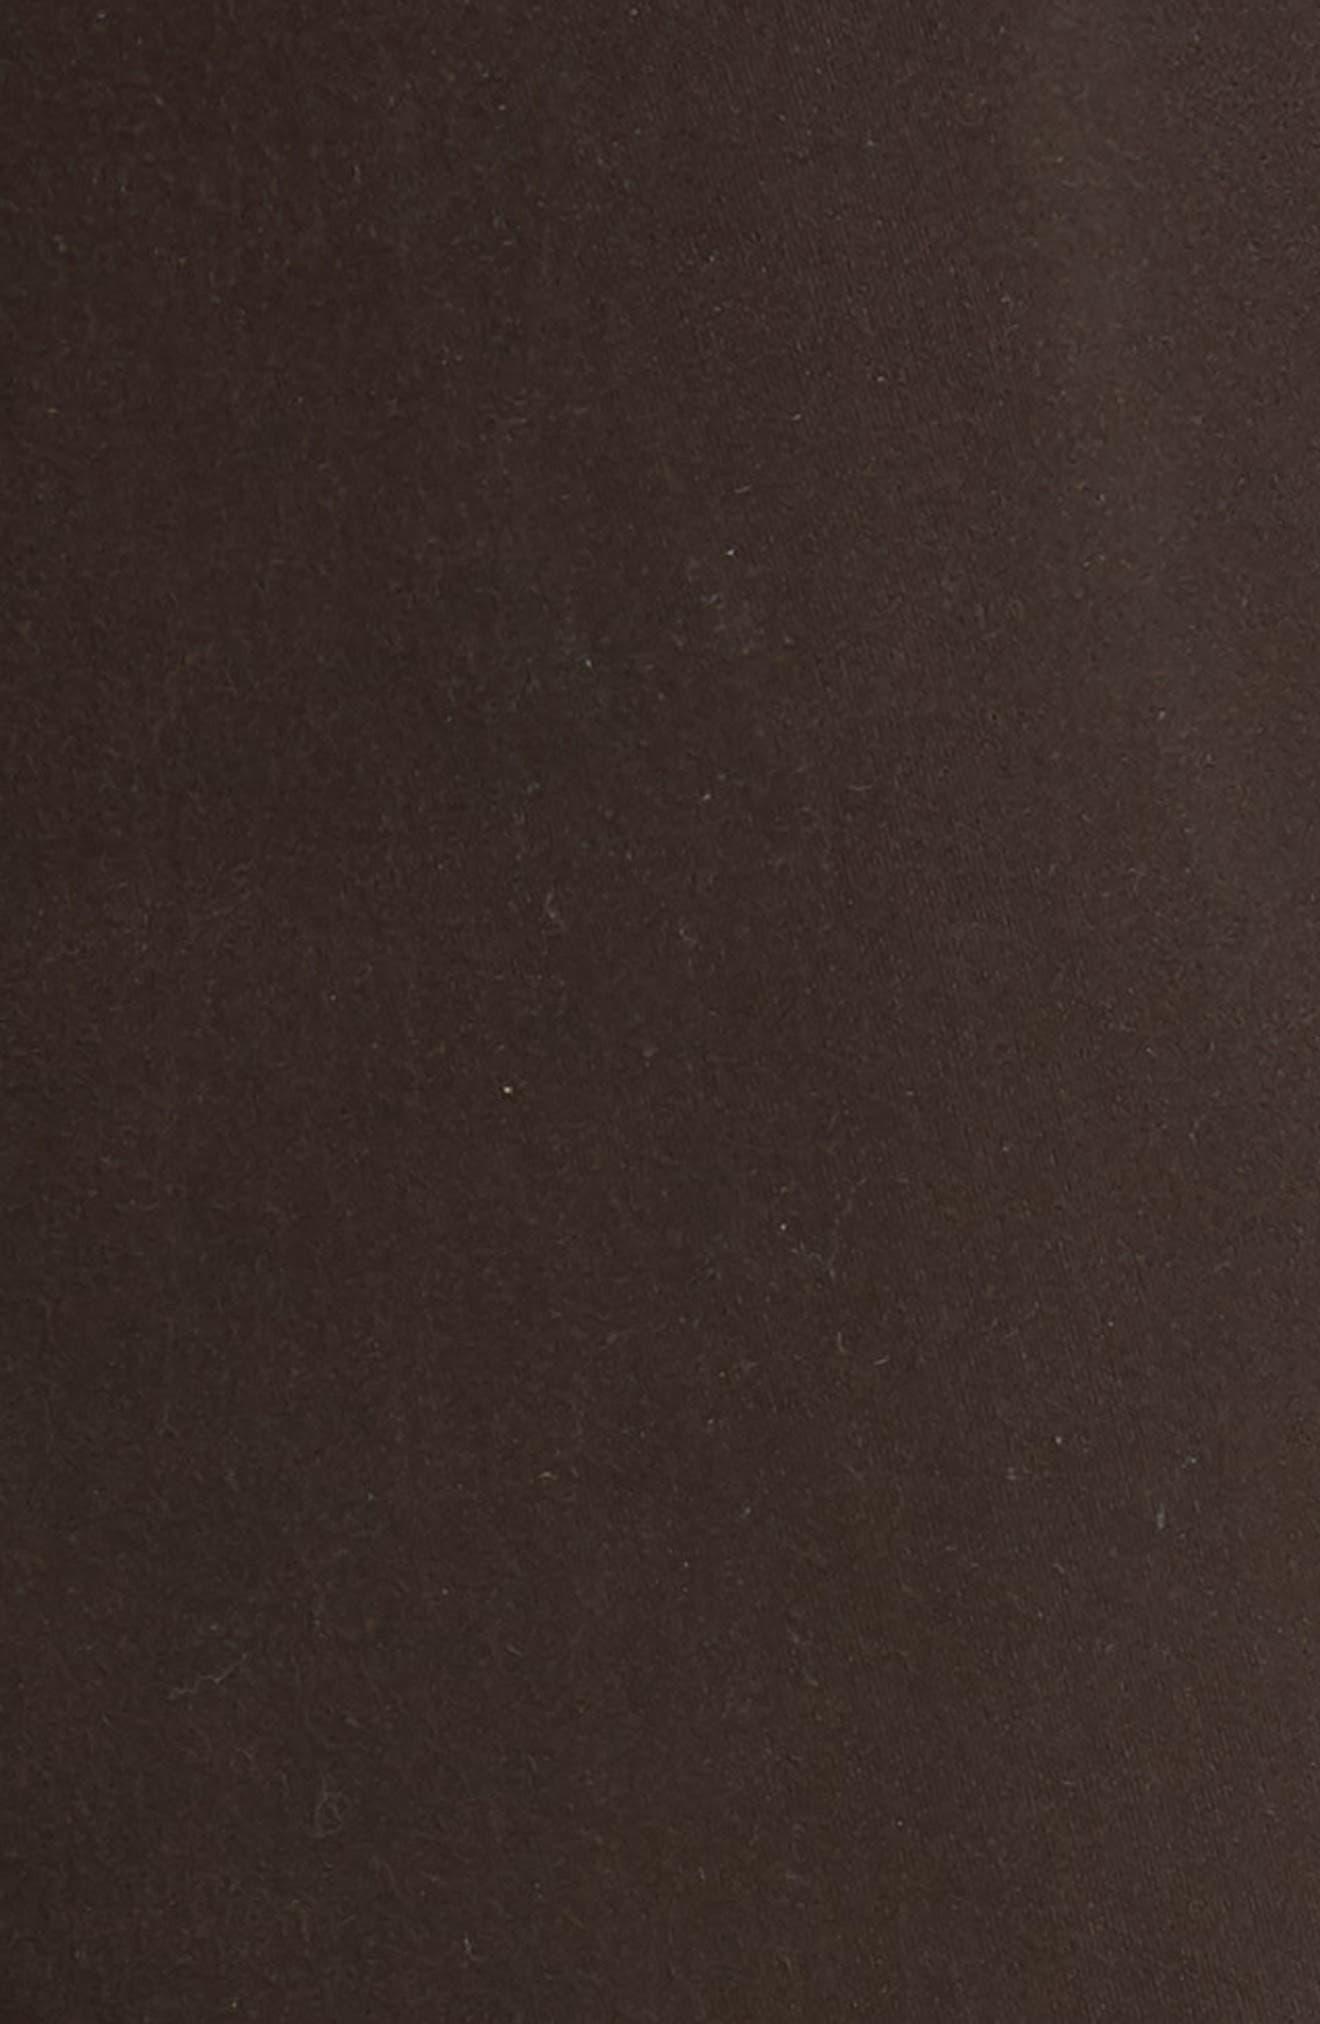 Tellis SUD Modern Slim Stretch Twill Pants,                             Alternate thumbnail 5, color,                             Shutter Brown